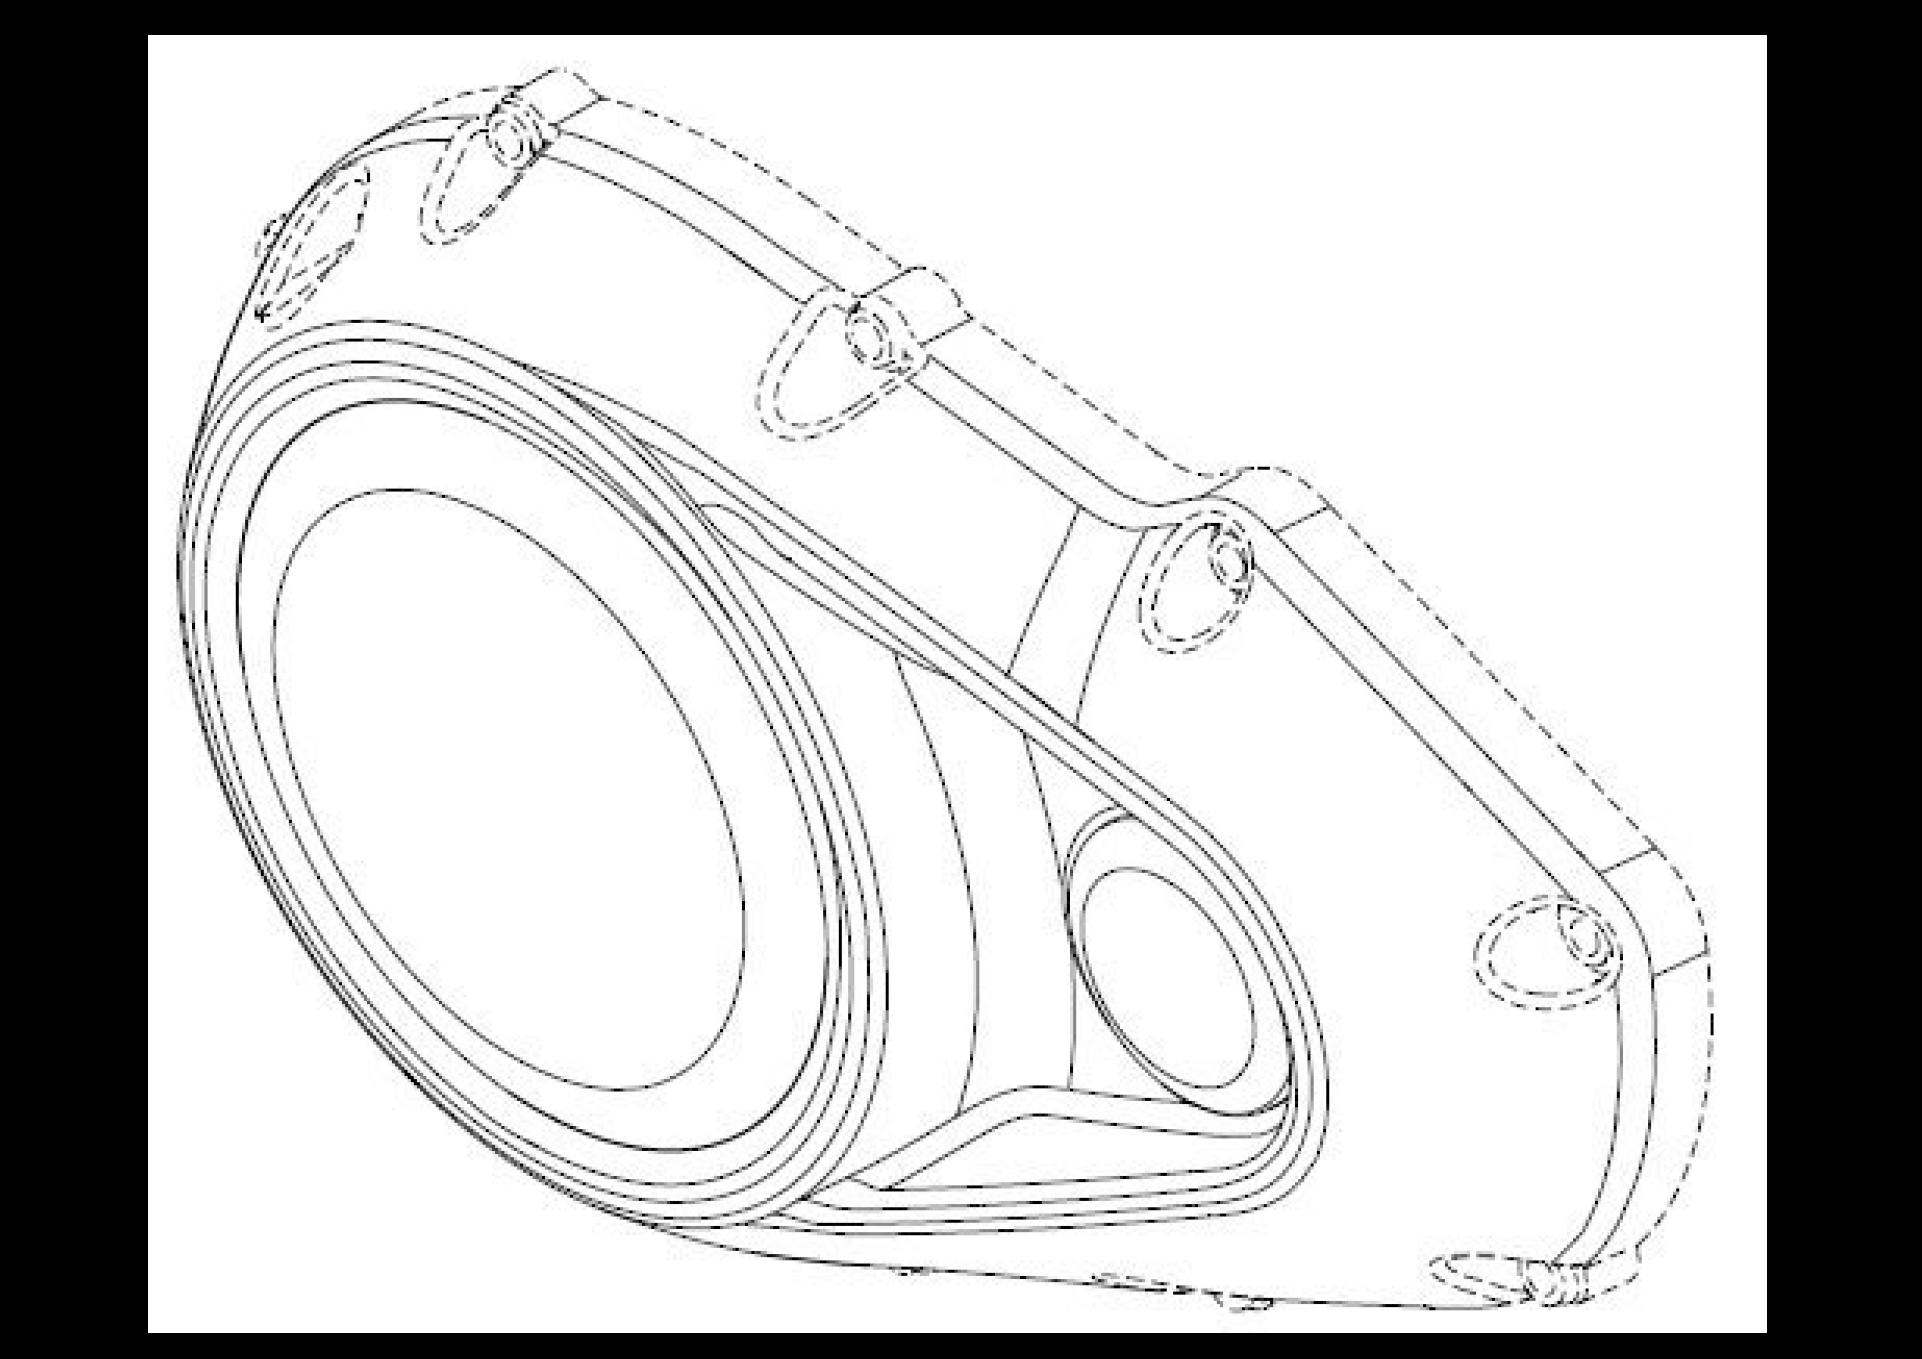 040419-harley-davidson-new-60-degree-v-twin-engine-0002-1